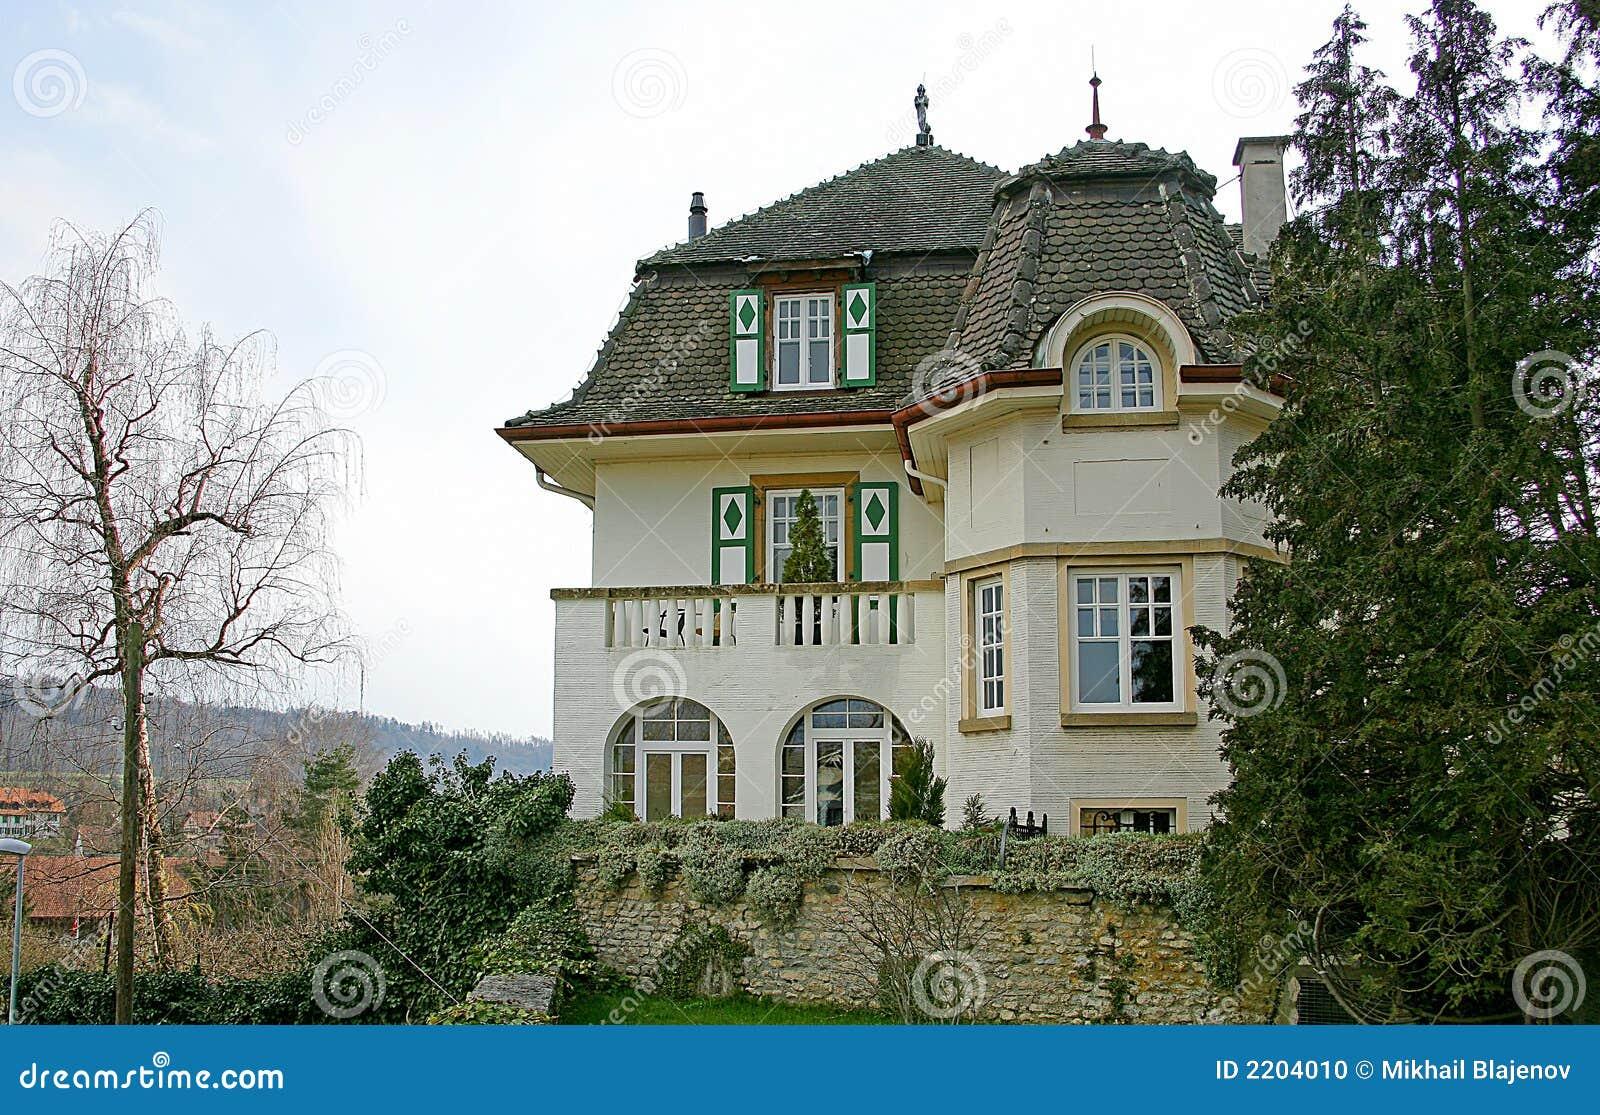 Photos of Swiss House for Rent - Chalet Kandersteg - RentVillas.com